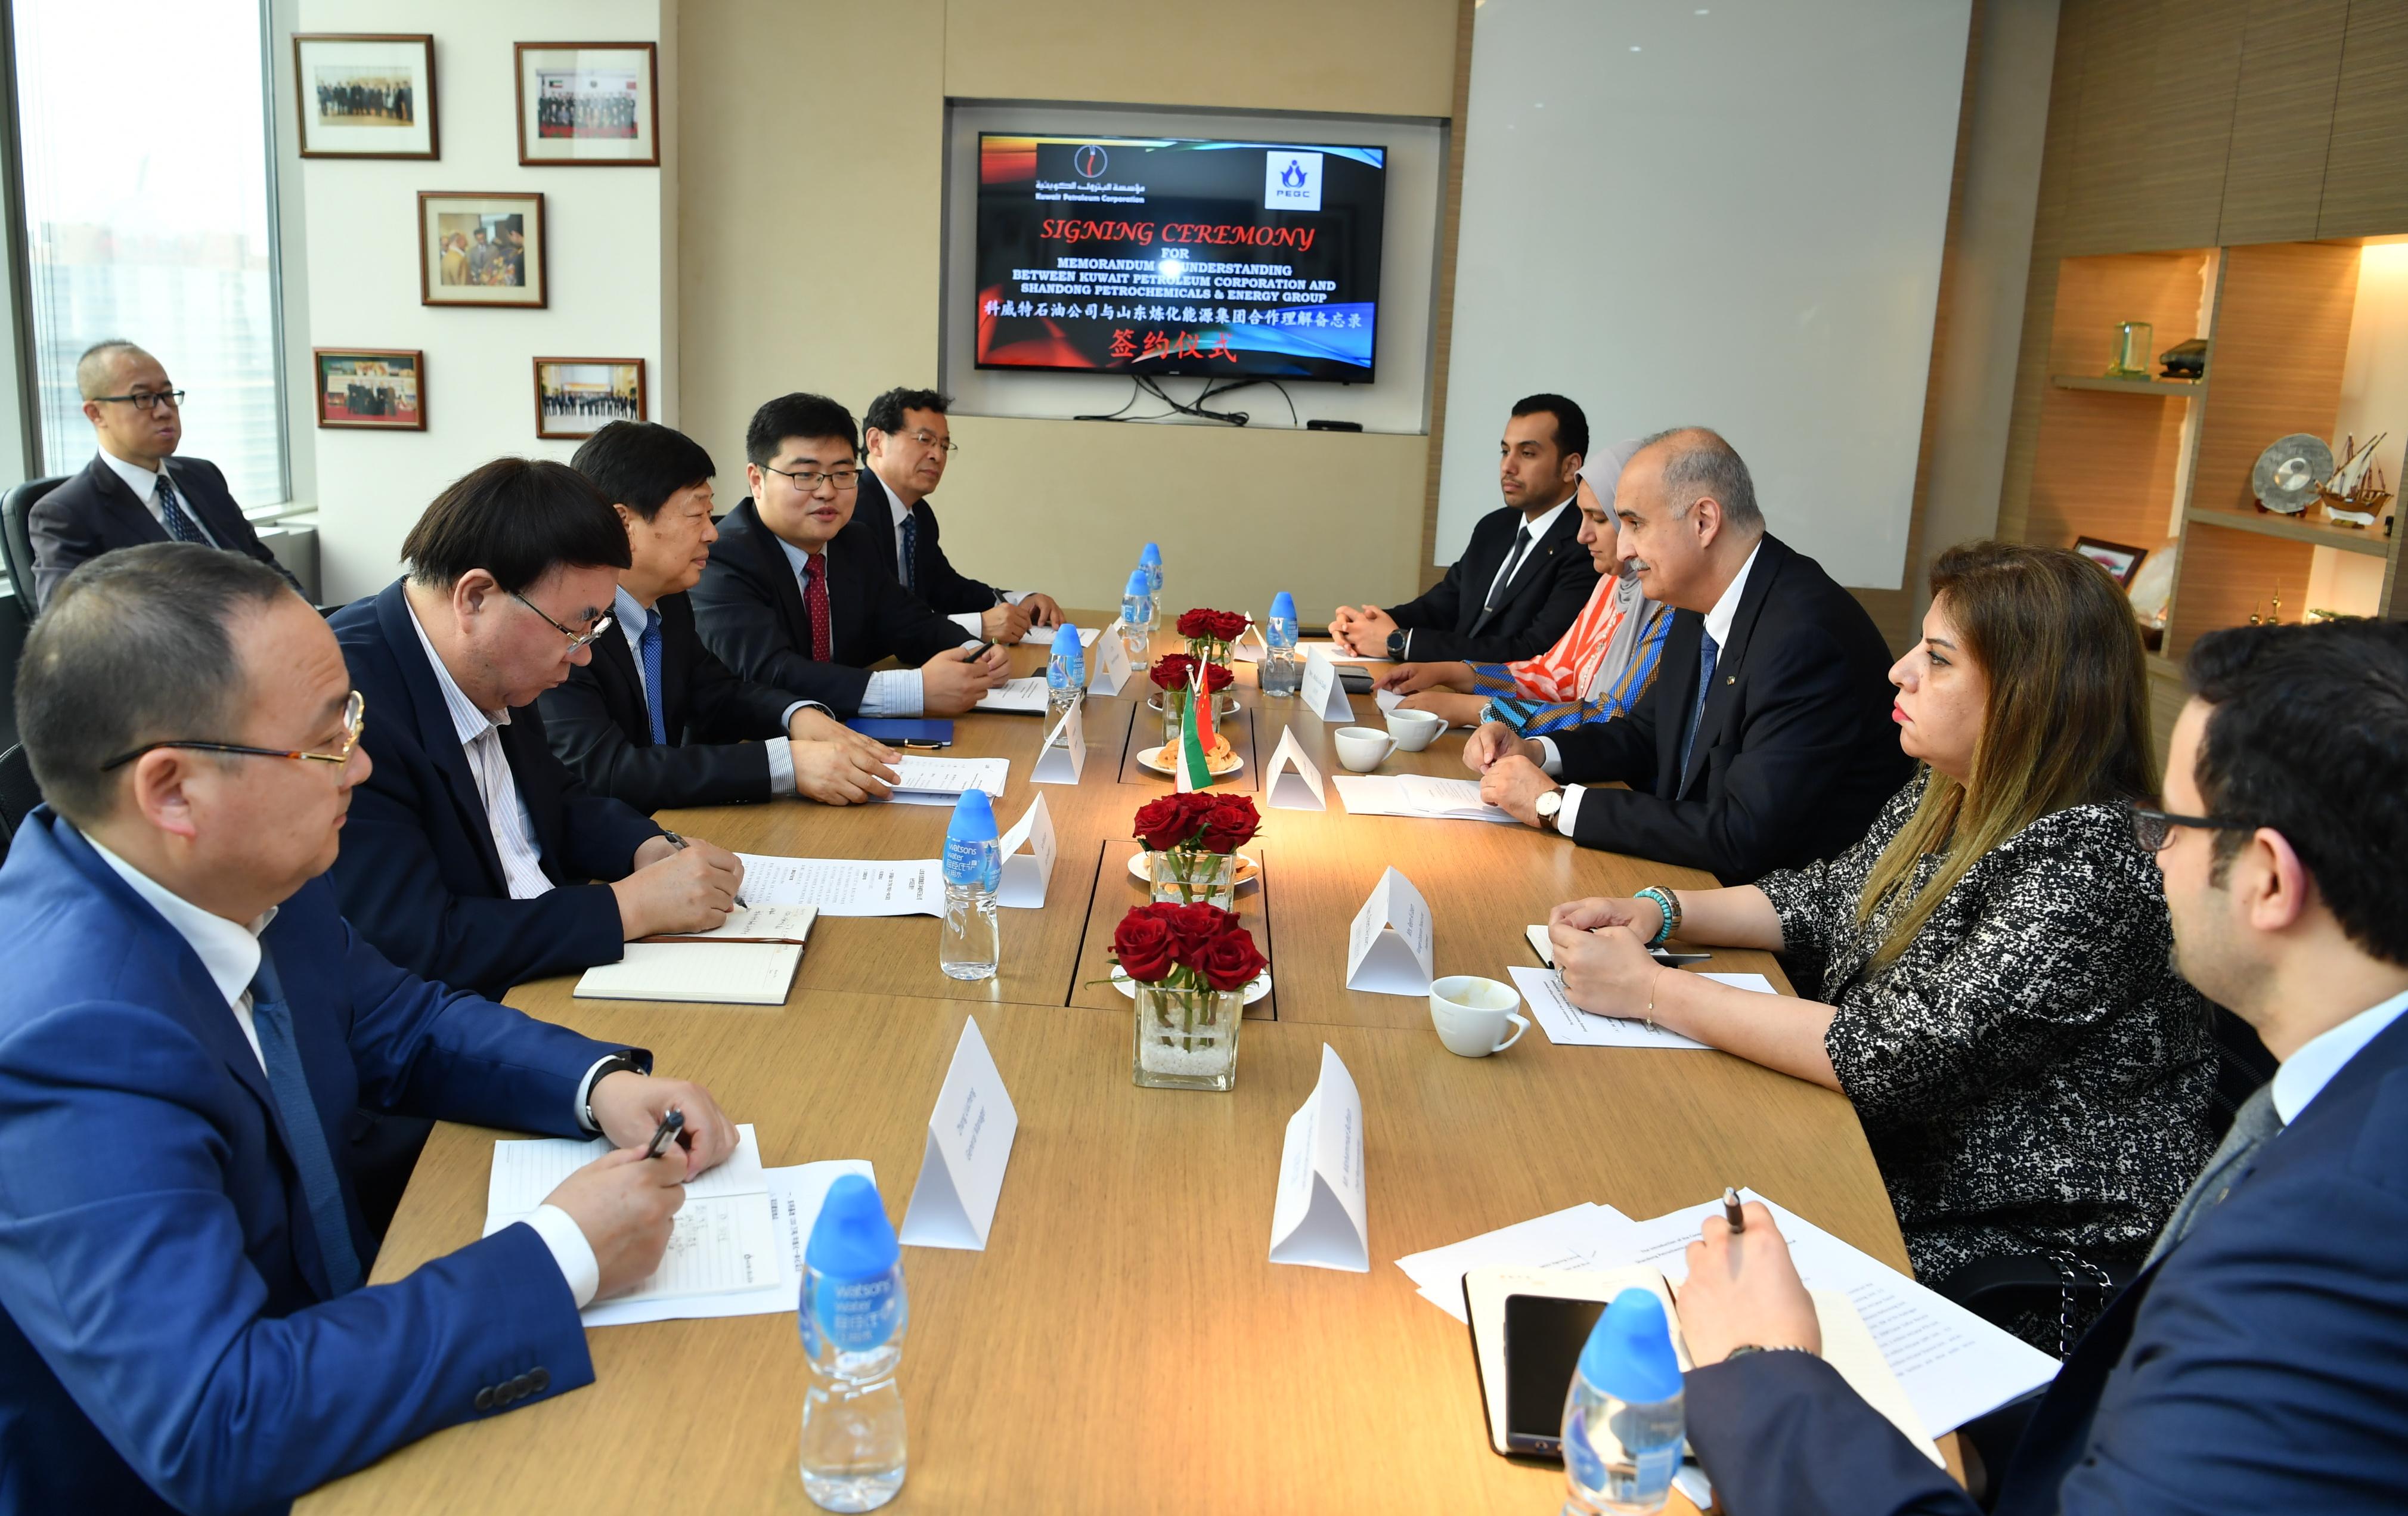 KUNA : Kuwait, China sign crude oil joint marketing deal